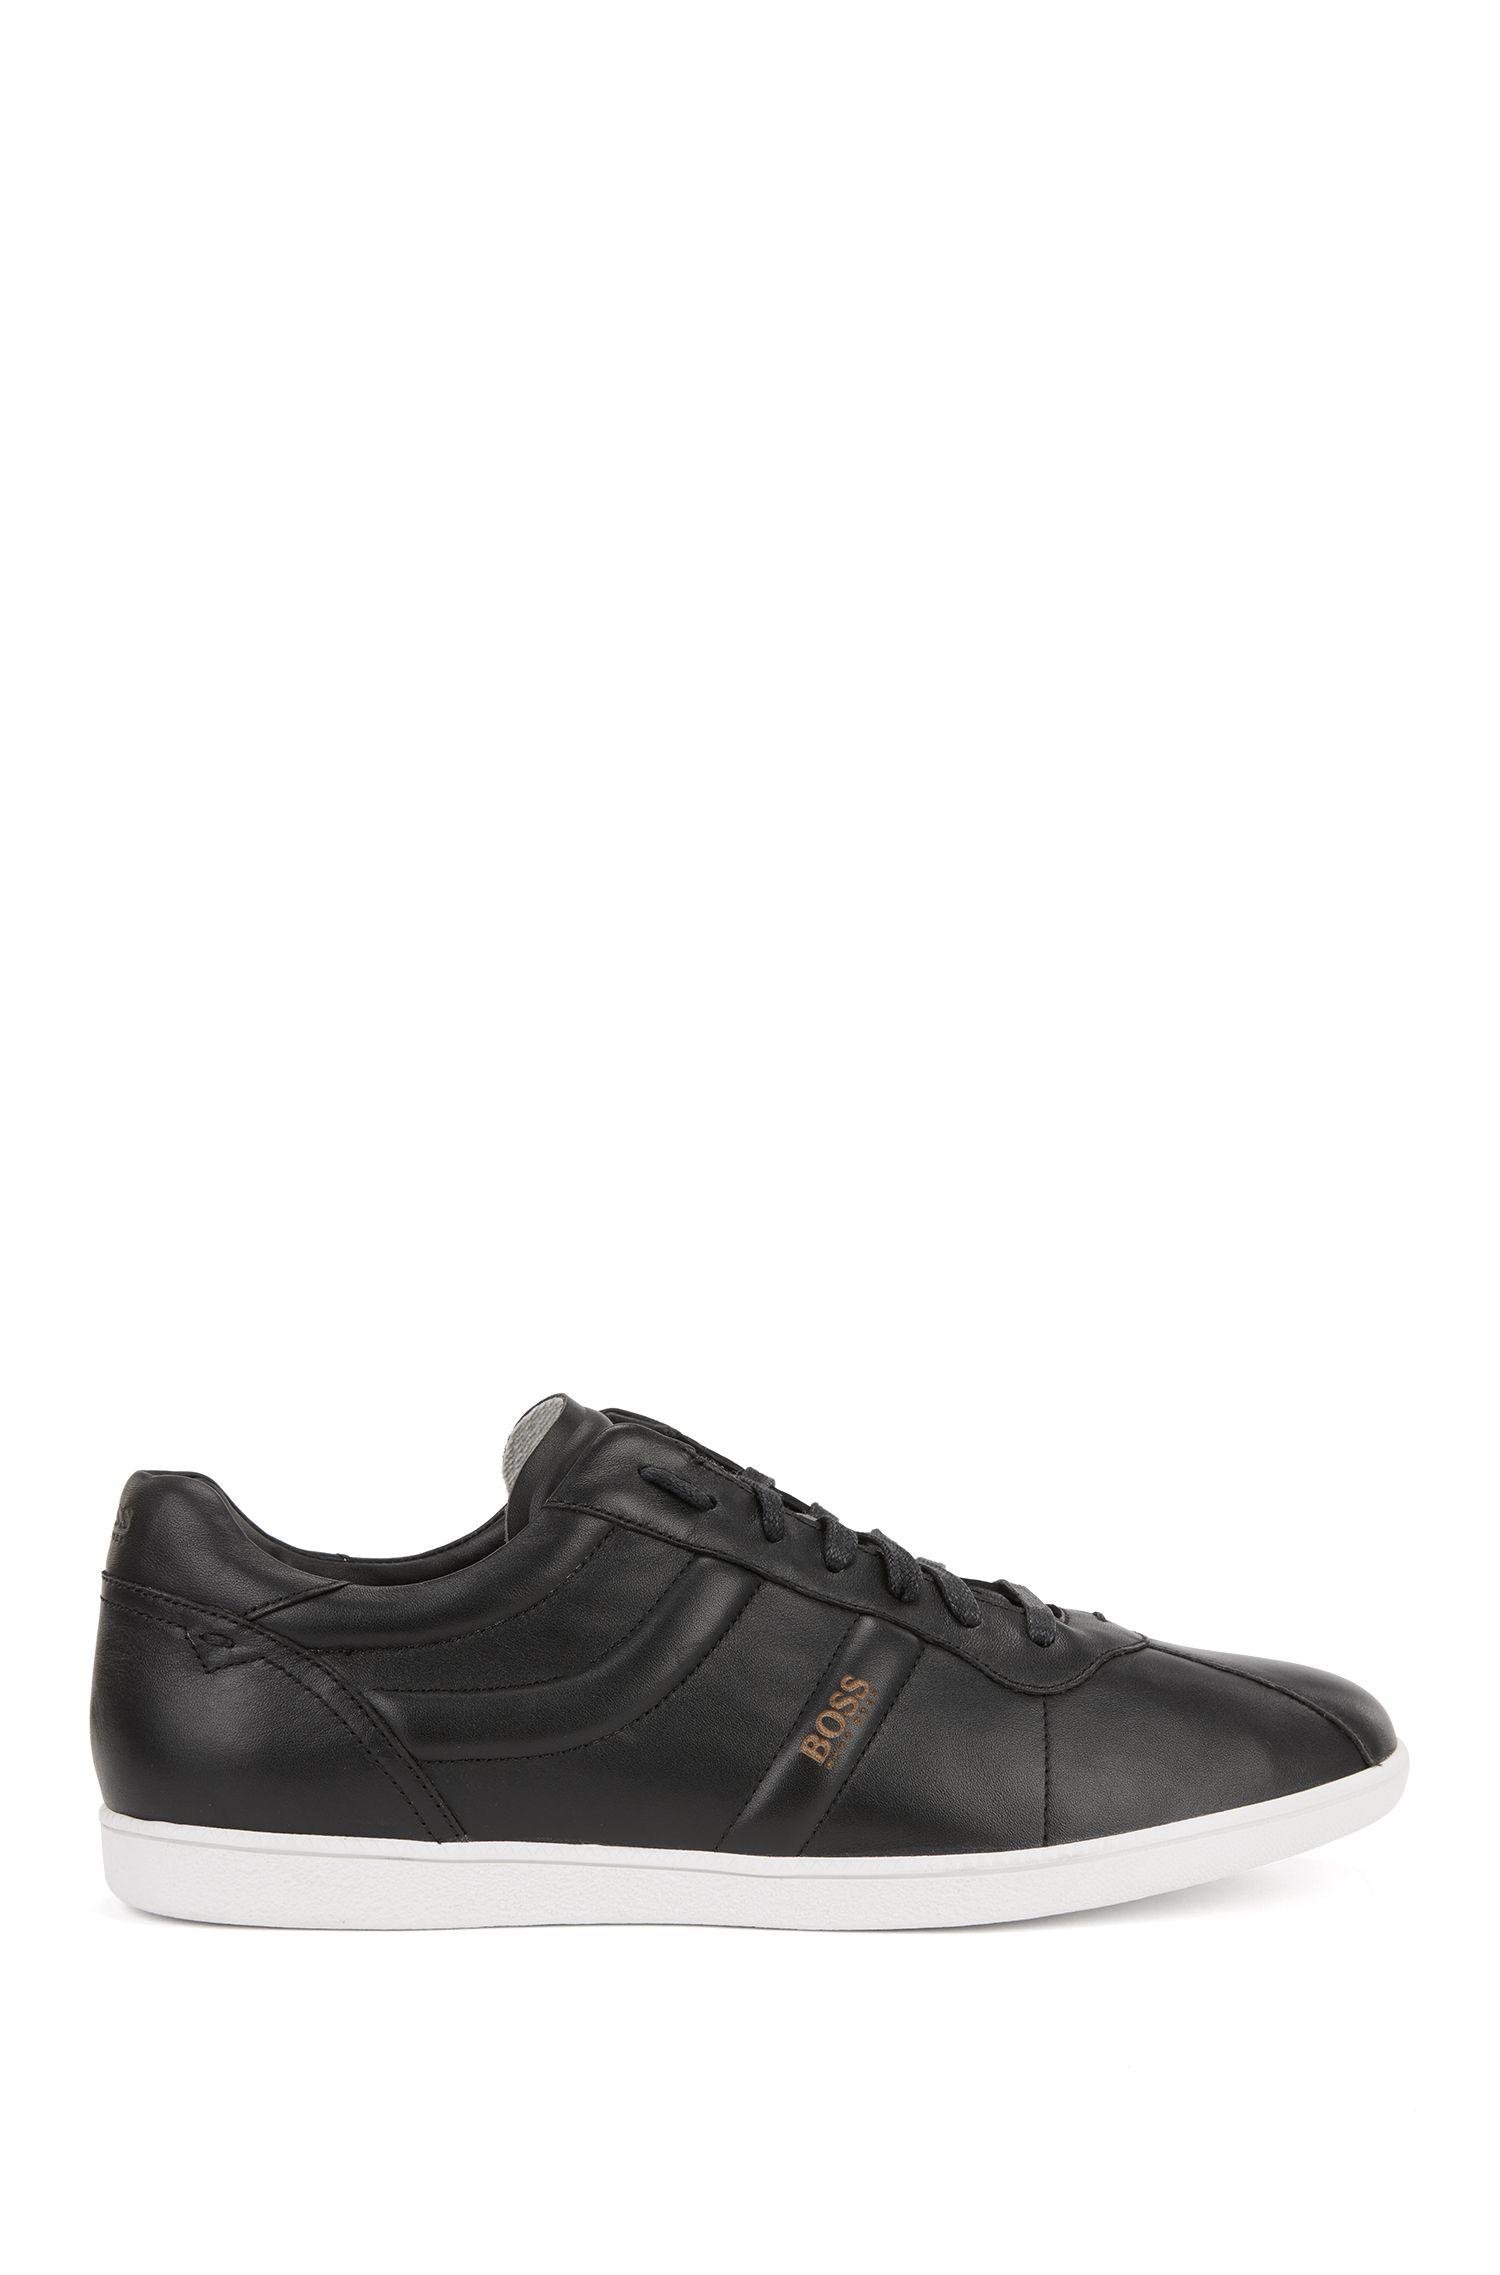 Sneakers aus Nappaleder